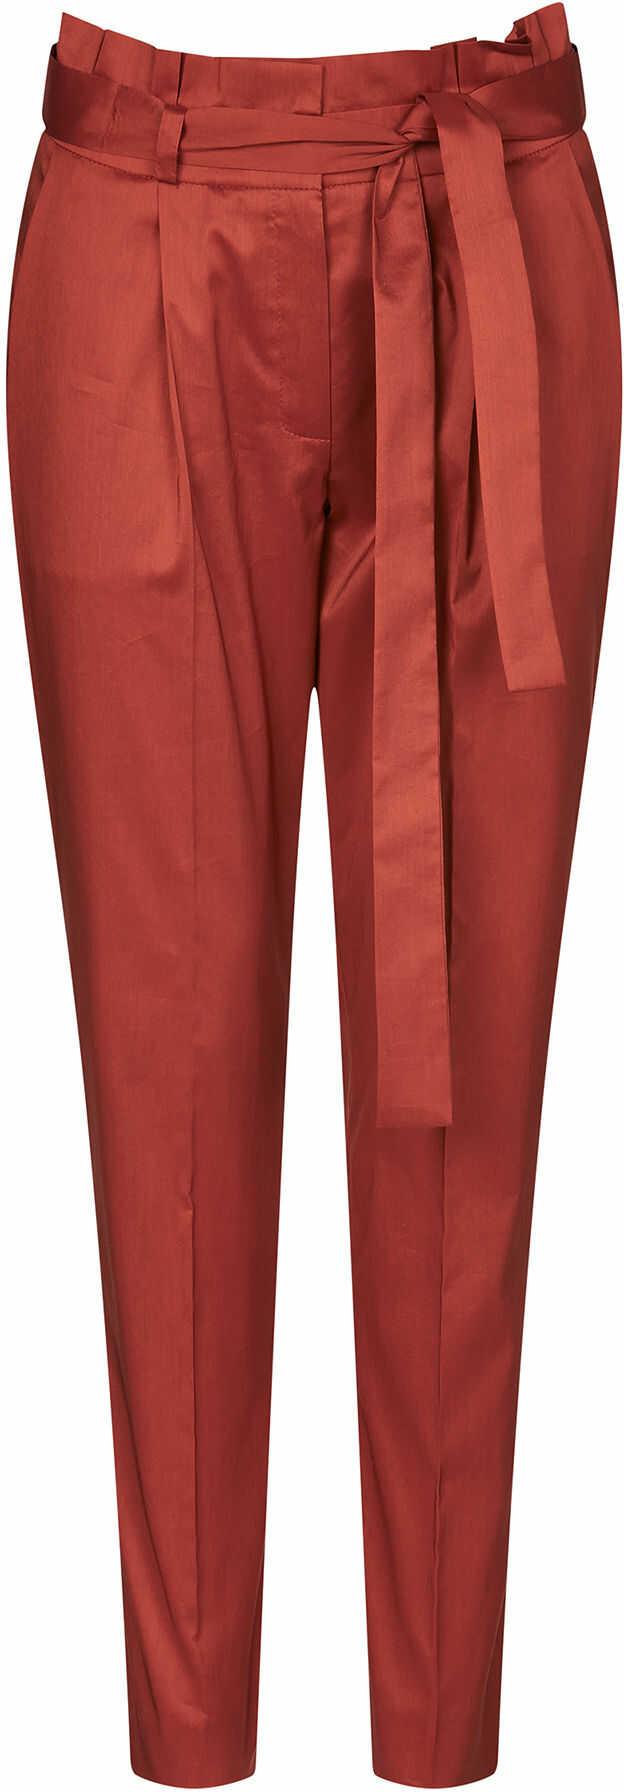 Tkaninowe spodnie paperbag